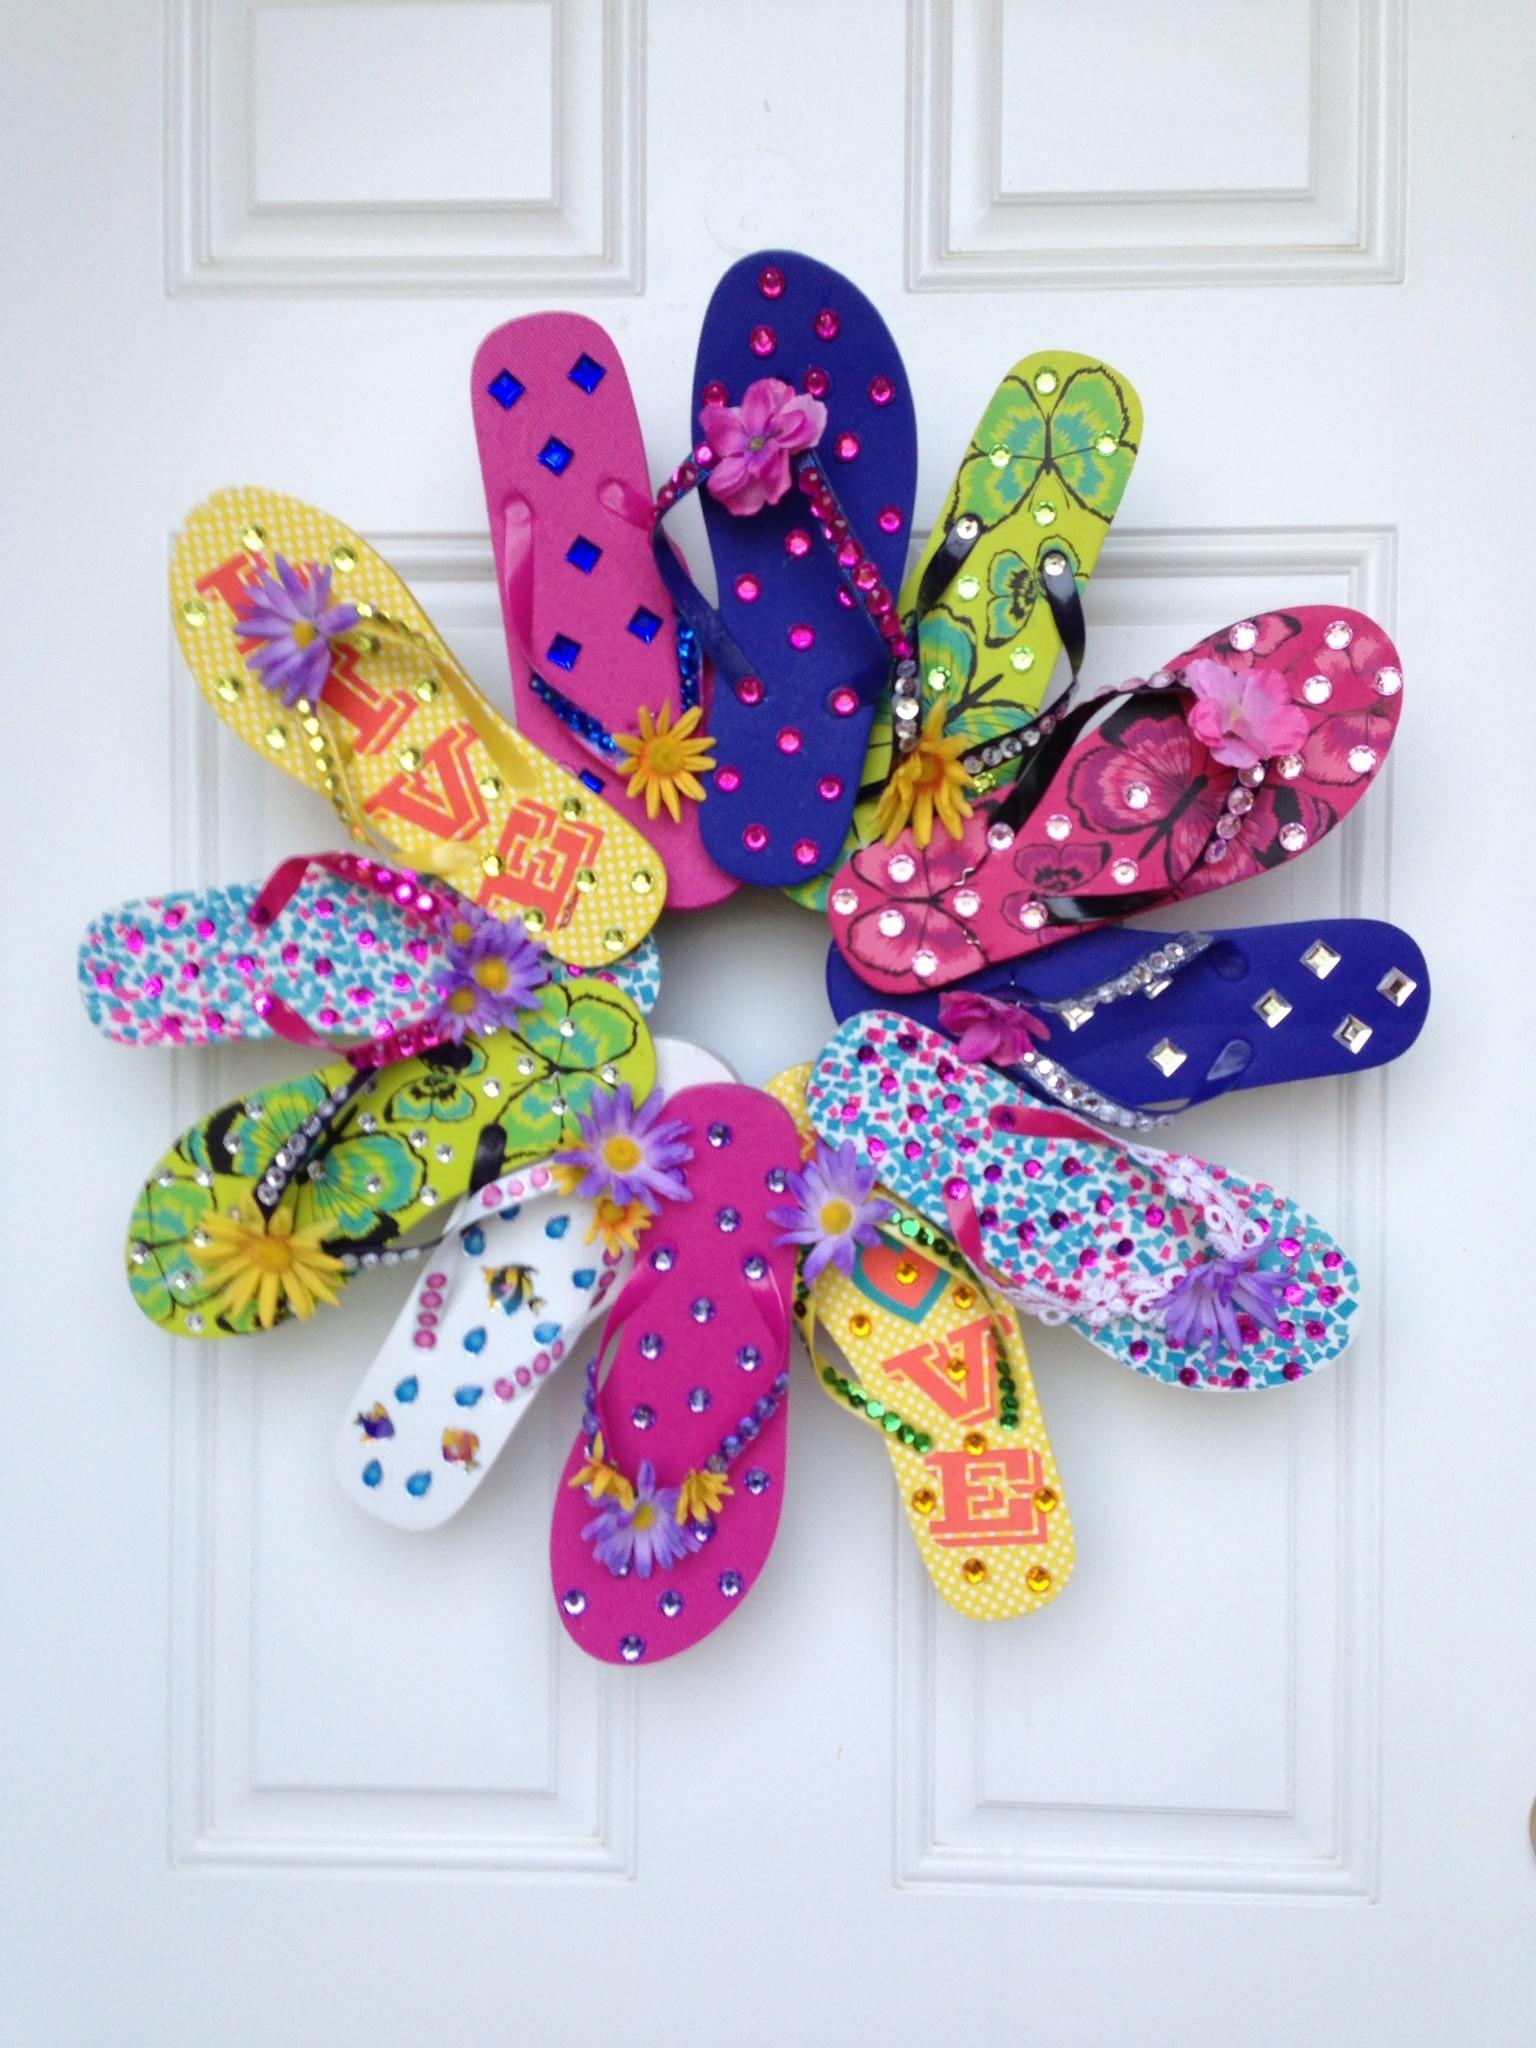 flops i flop decor mondays ideas make interchangeable img something decorating flip